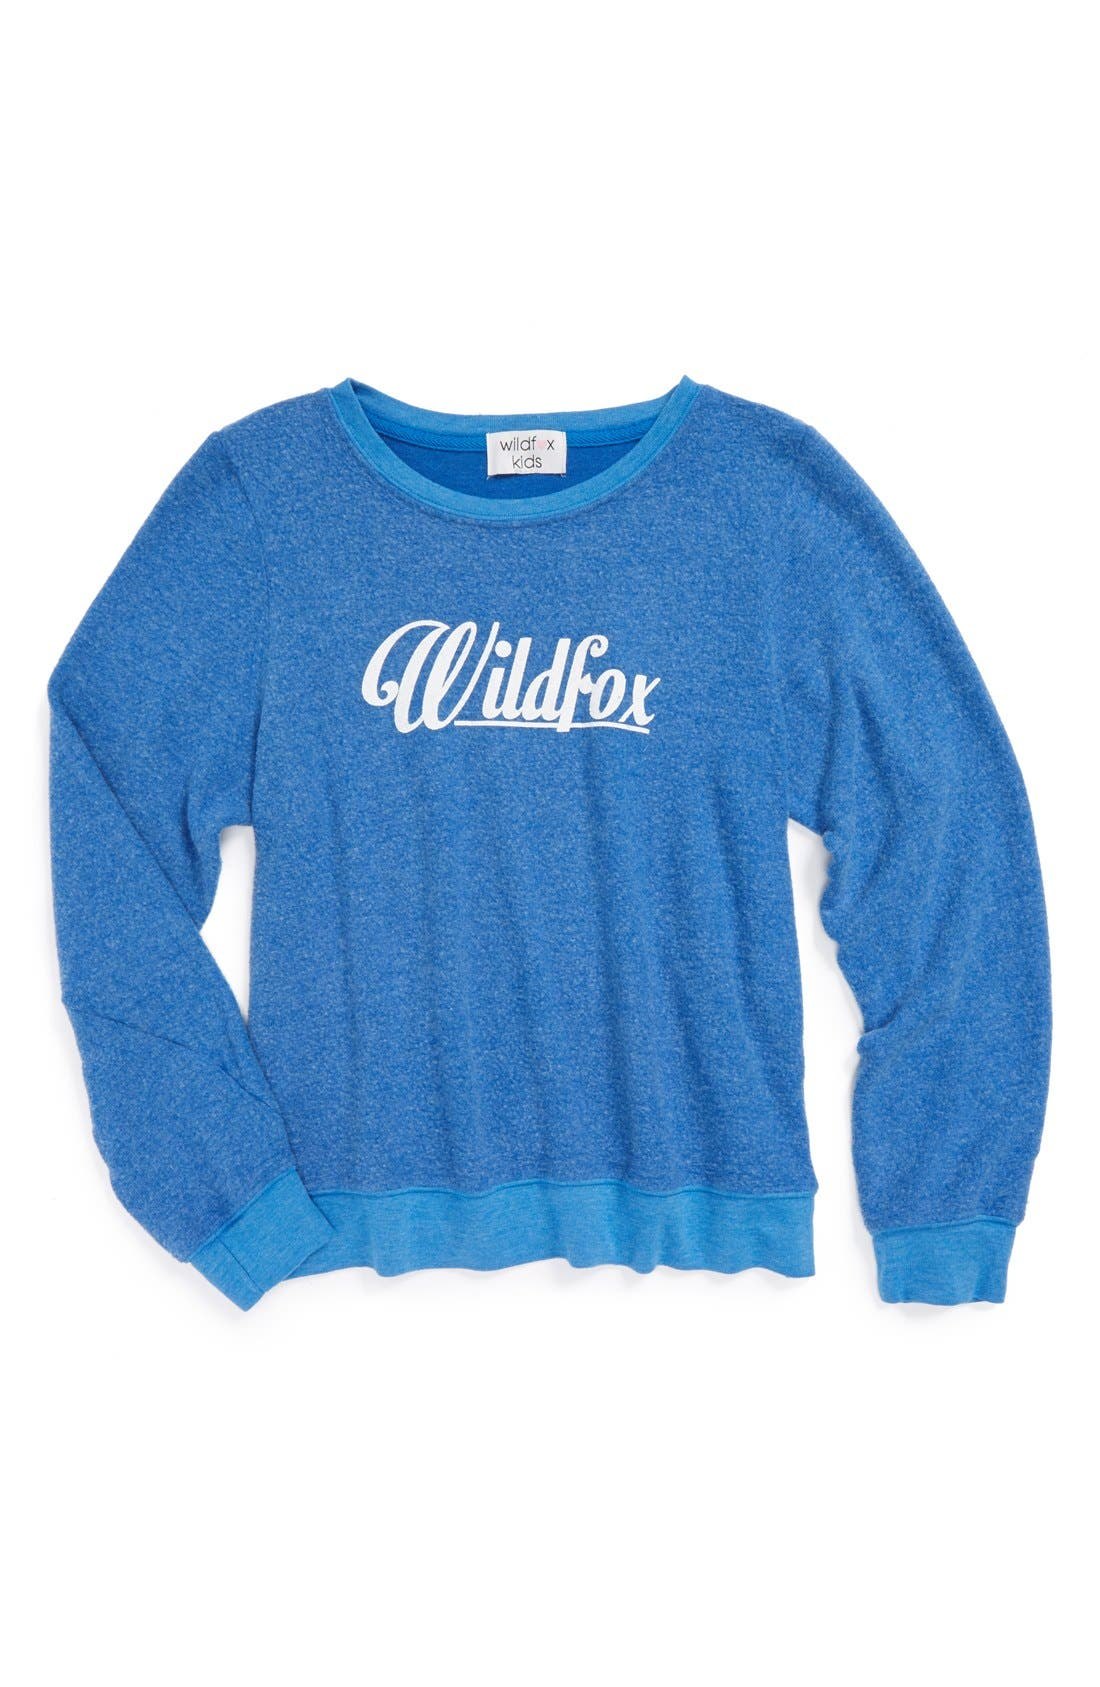 Main Image - Wildfox '60's' Lightweight Sweatshirt (Big Girls)